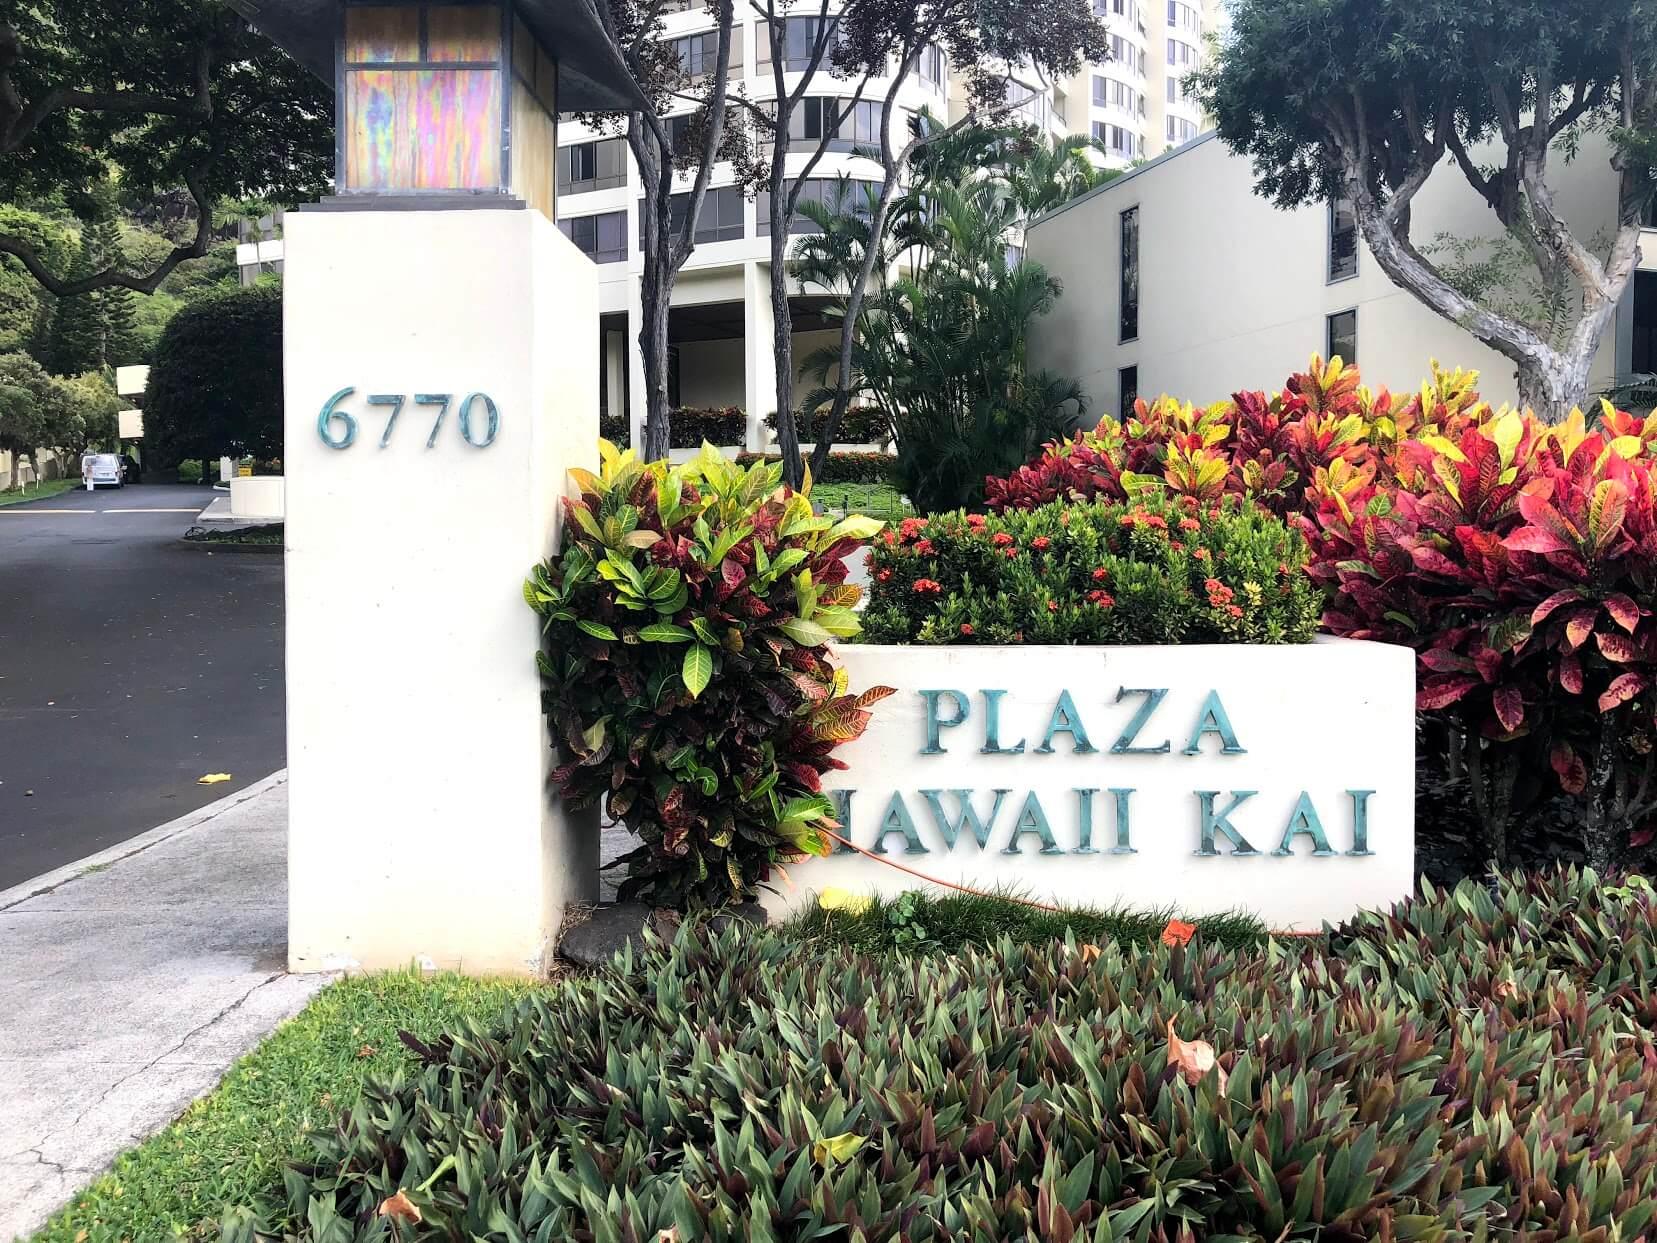 Plaza Hawaii Kai 6770の看板